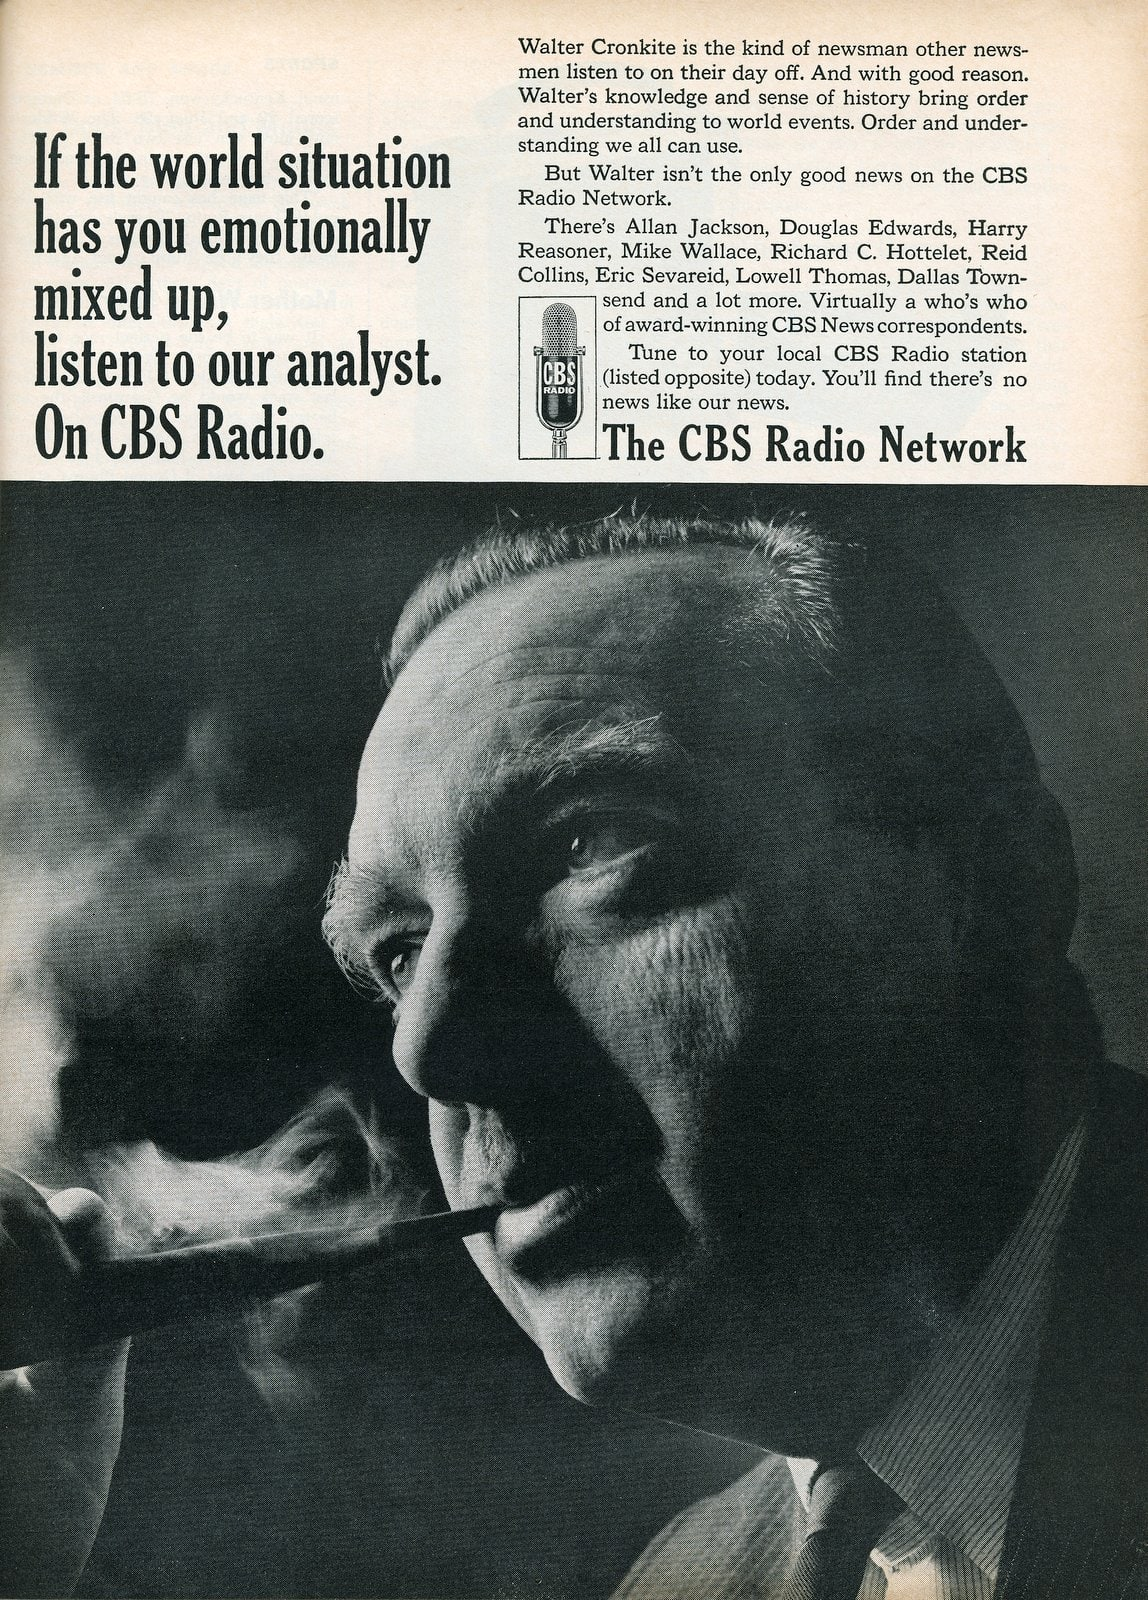 Walter Cronkite radio show (1966)